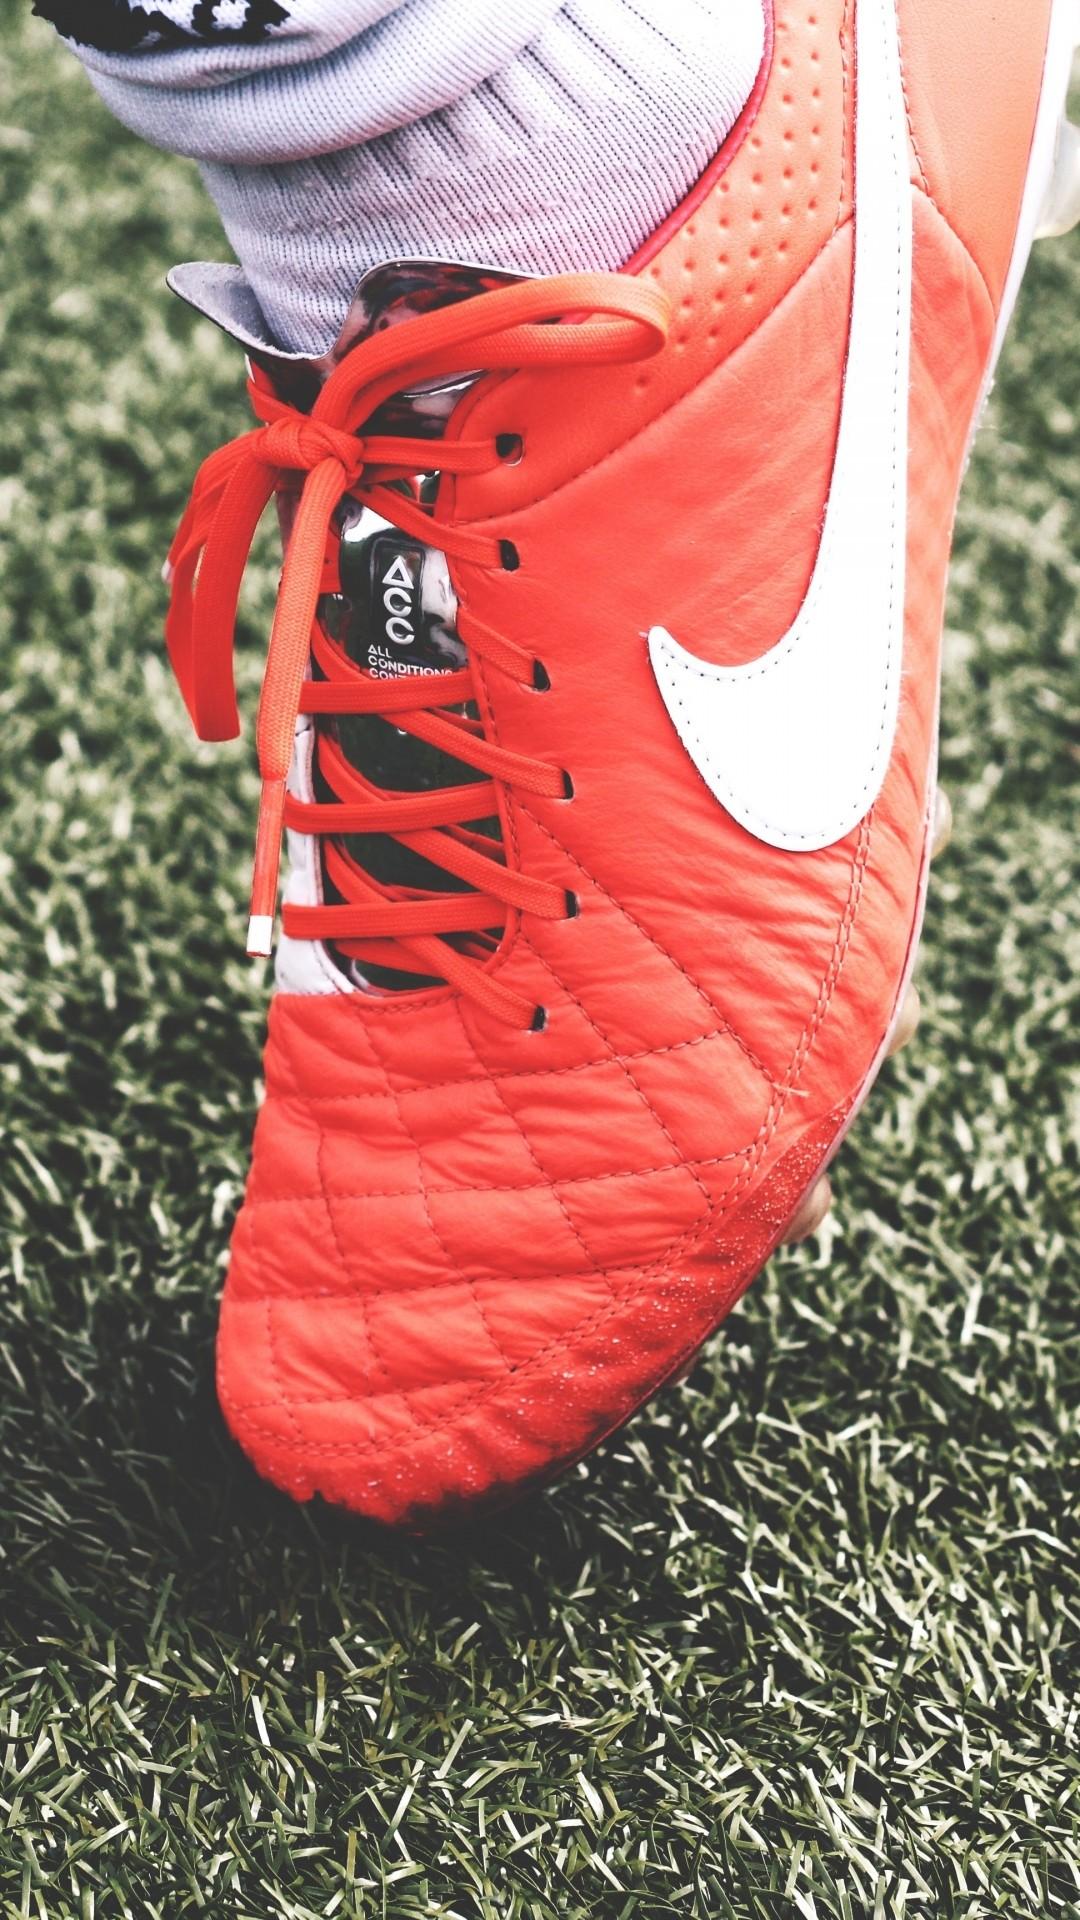 Res: 1080x1920, Nike Fußball Schuhe Rasen iPhone 8 Plus Wallpaper